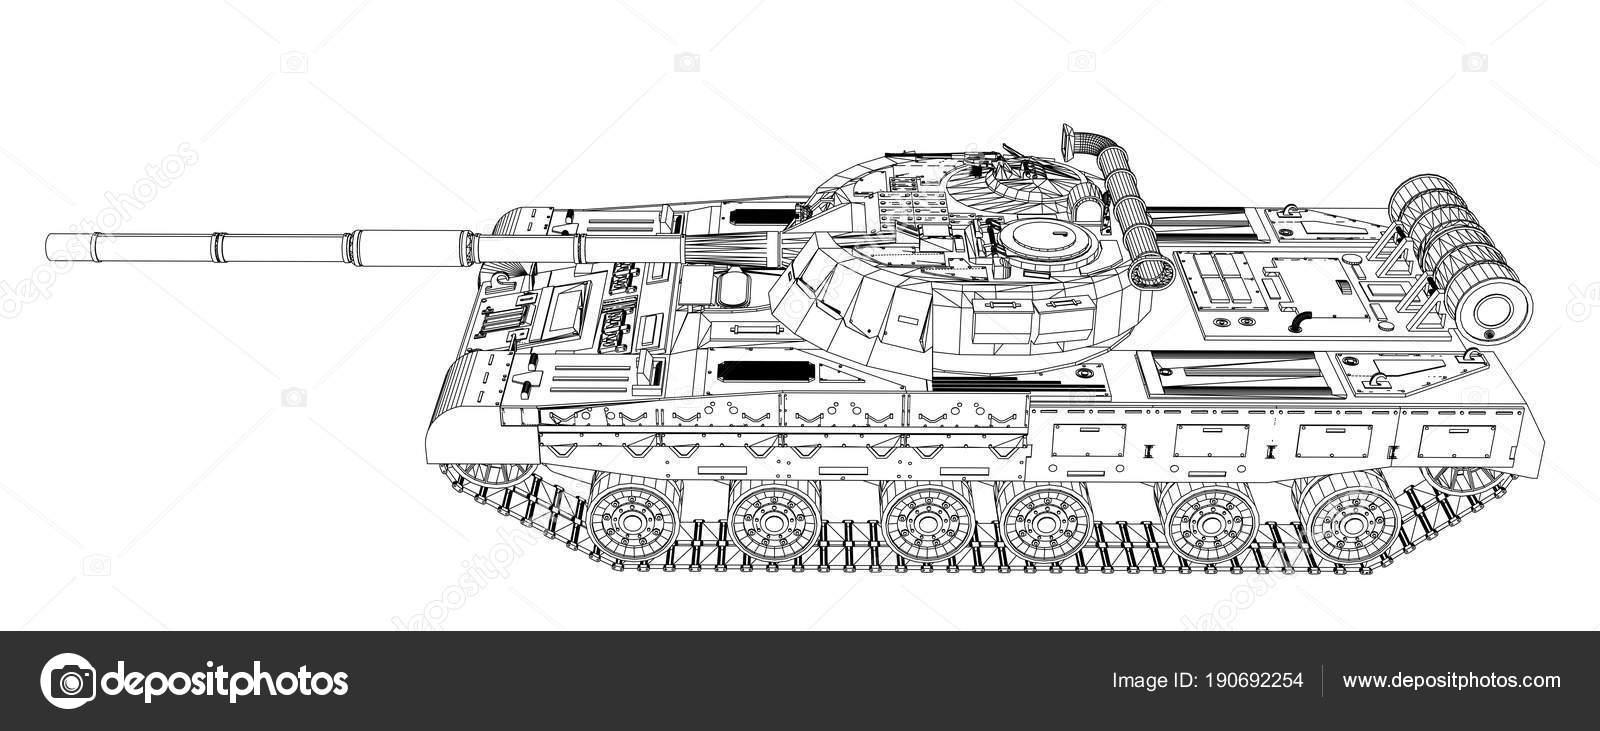 Blueprint of realistic tank stock photo cherezoff 190692254 blueprint or sketch of realistic tank 3d illustration photo by cherezoff malvernweather Image collections